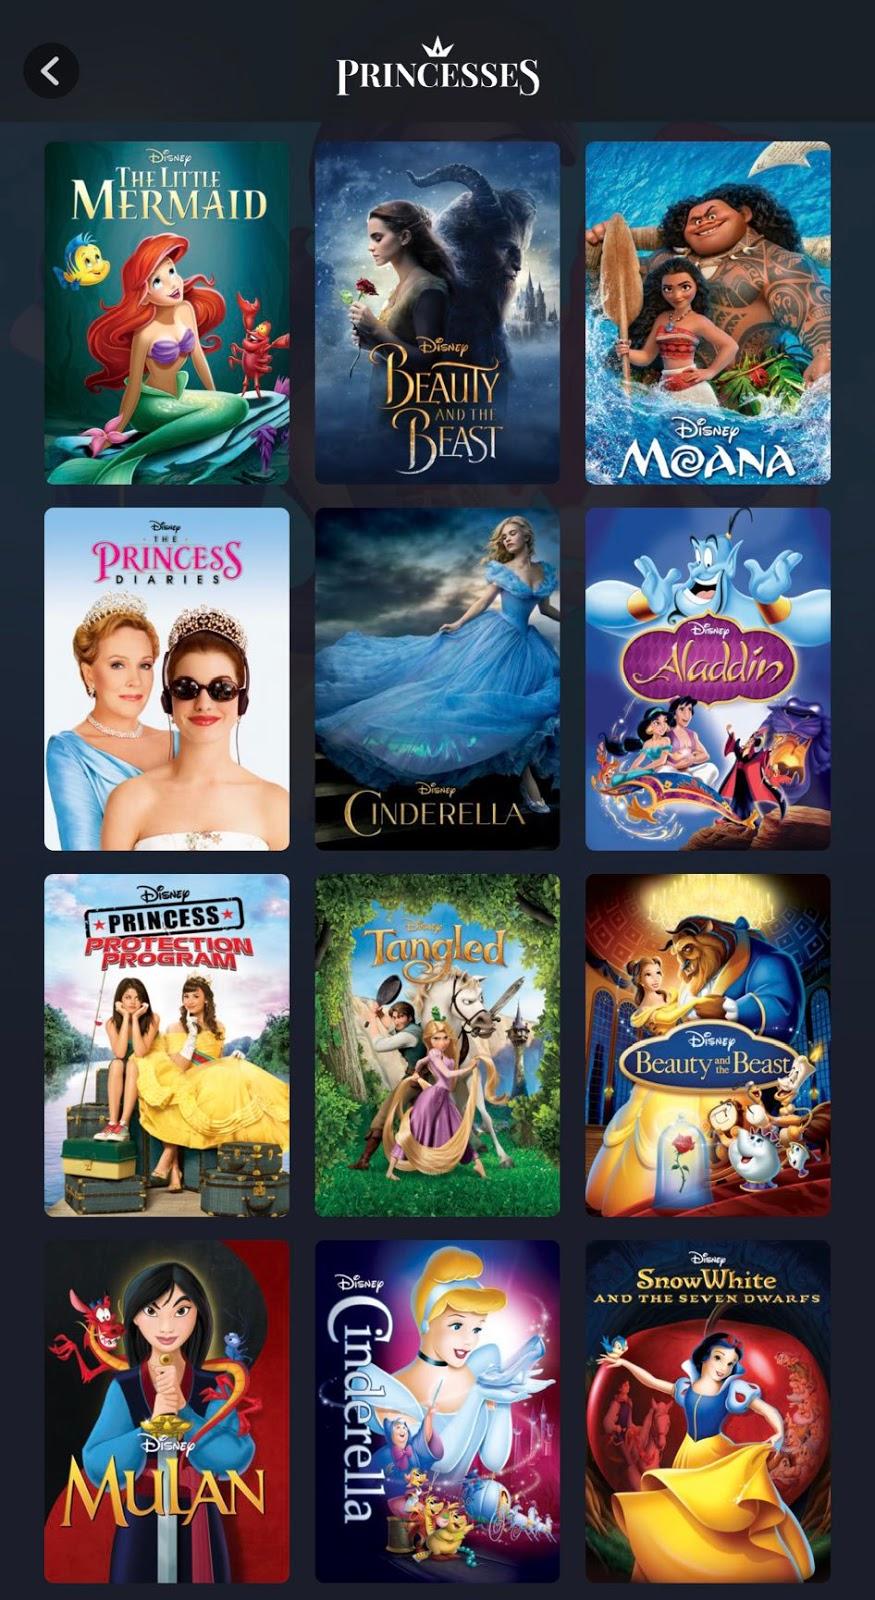 Everything Princess So Far on Disney+